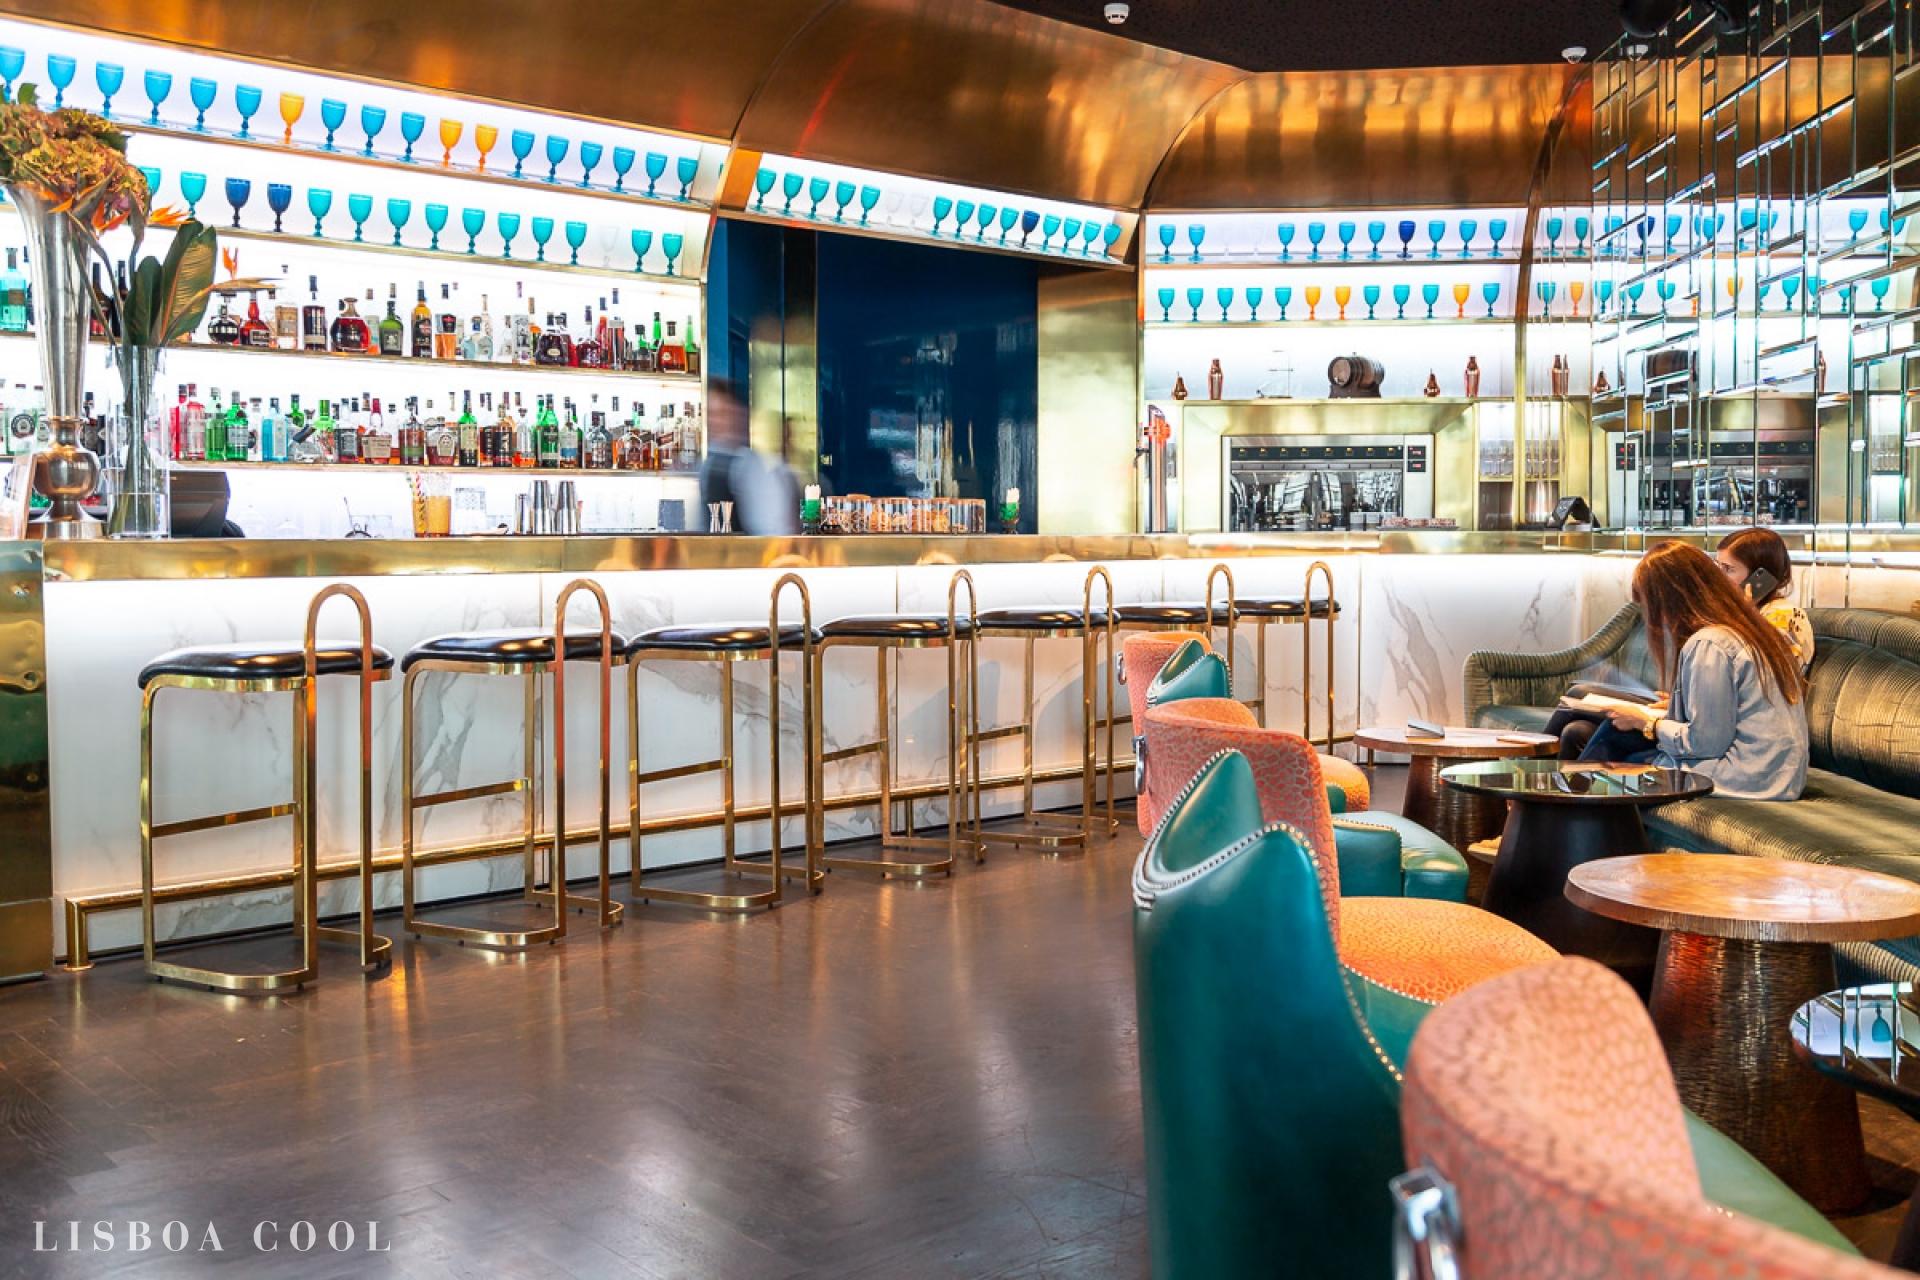 LisboaCool_Sair_Uptown Bar